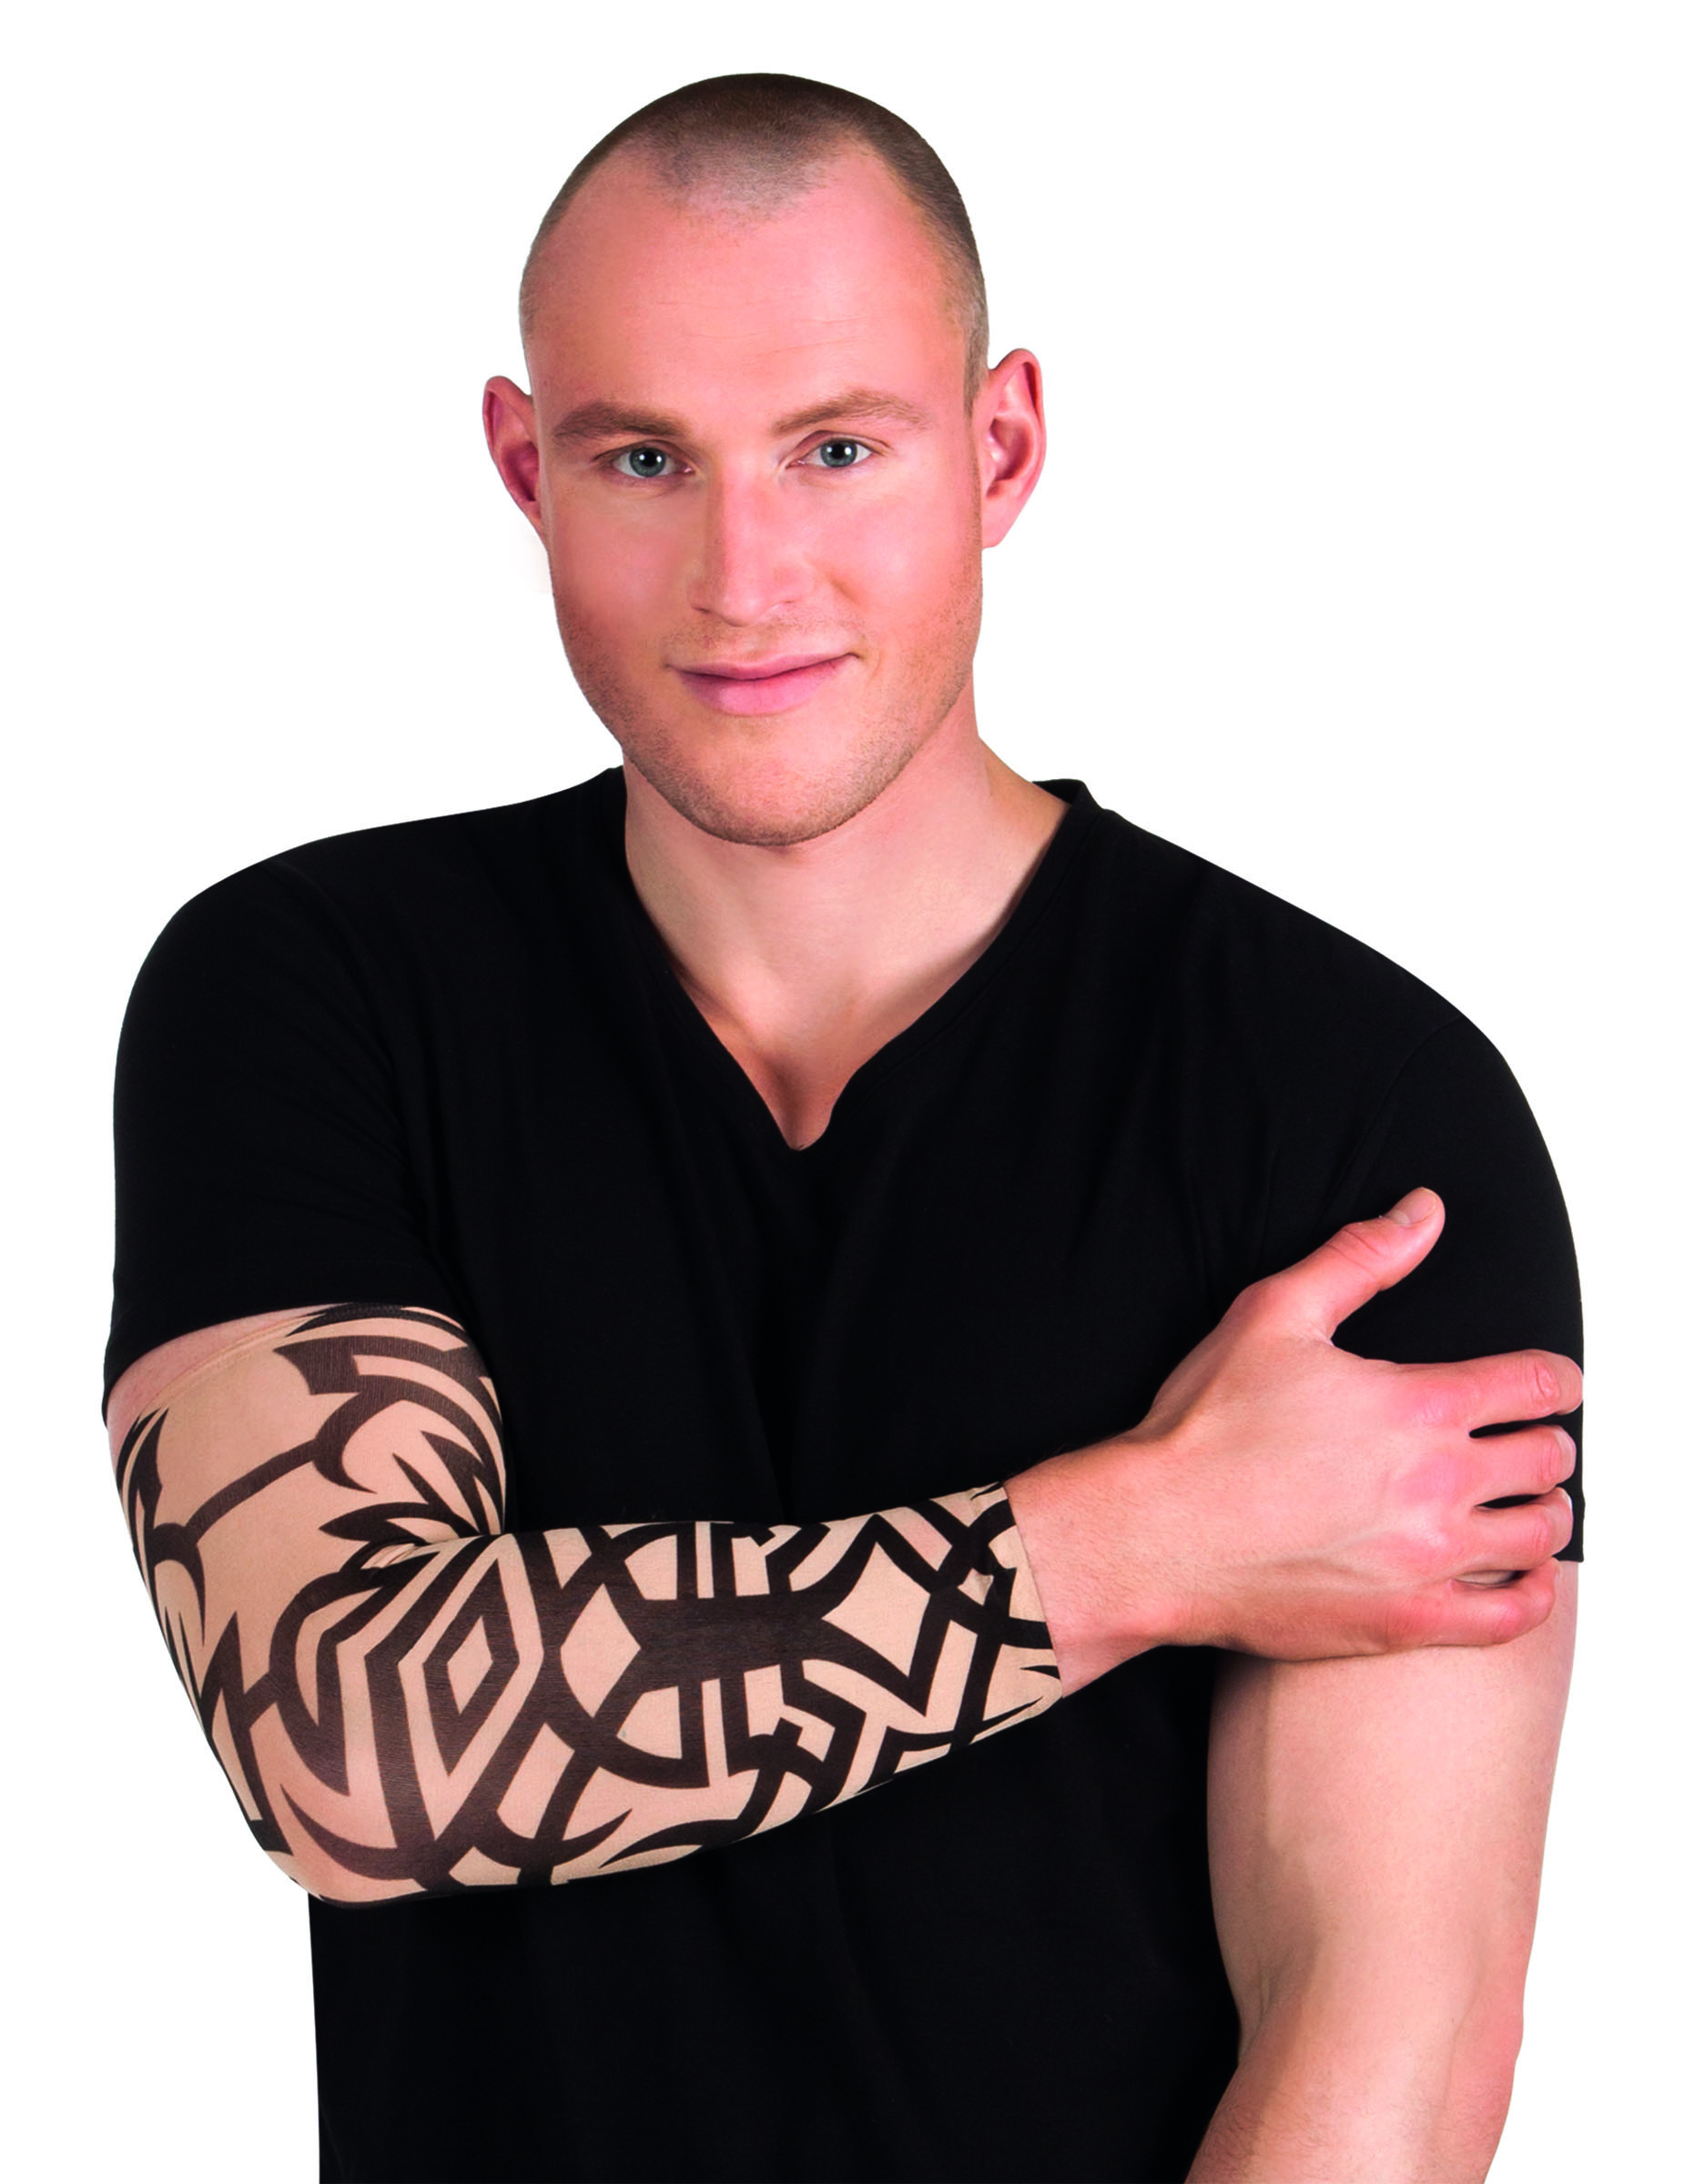 tattoo rmel tribals g nstige faschings accessoires zubeh r bei karneval megastore. Black Bedroom Furniture Sets. Home Design Ideas